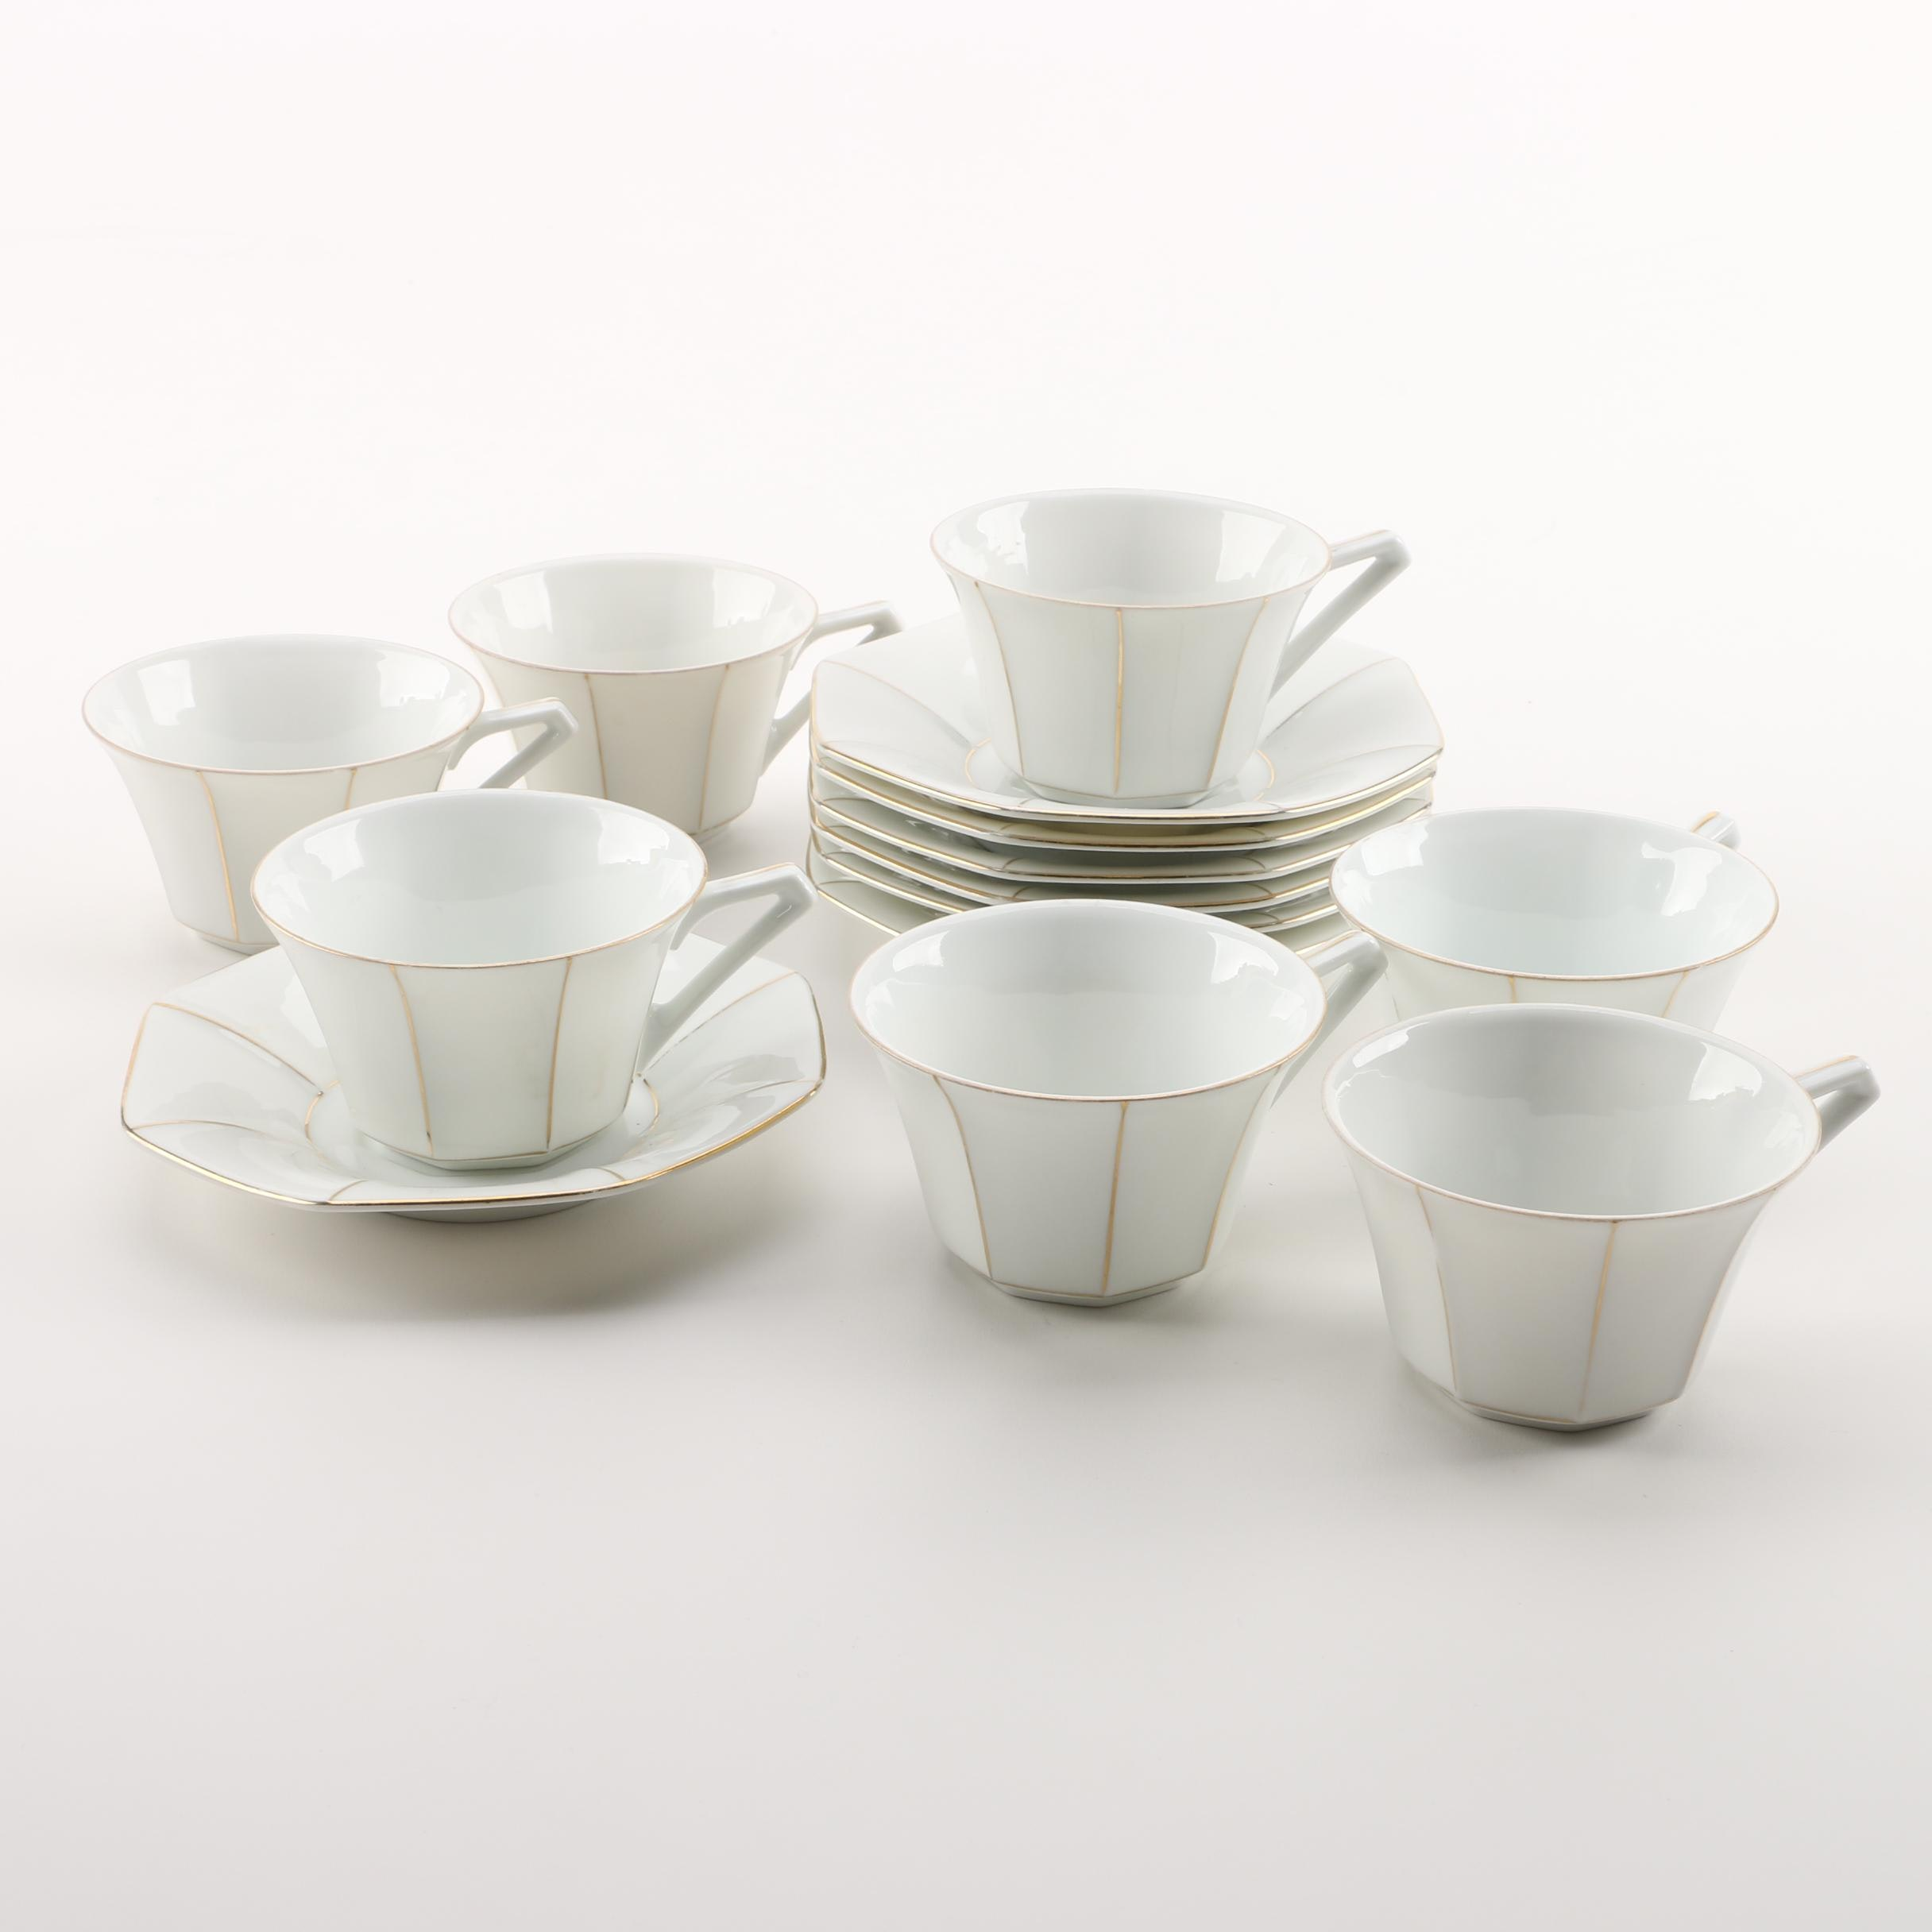 Vintage Victoria Porcelain Teacups and Saucers